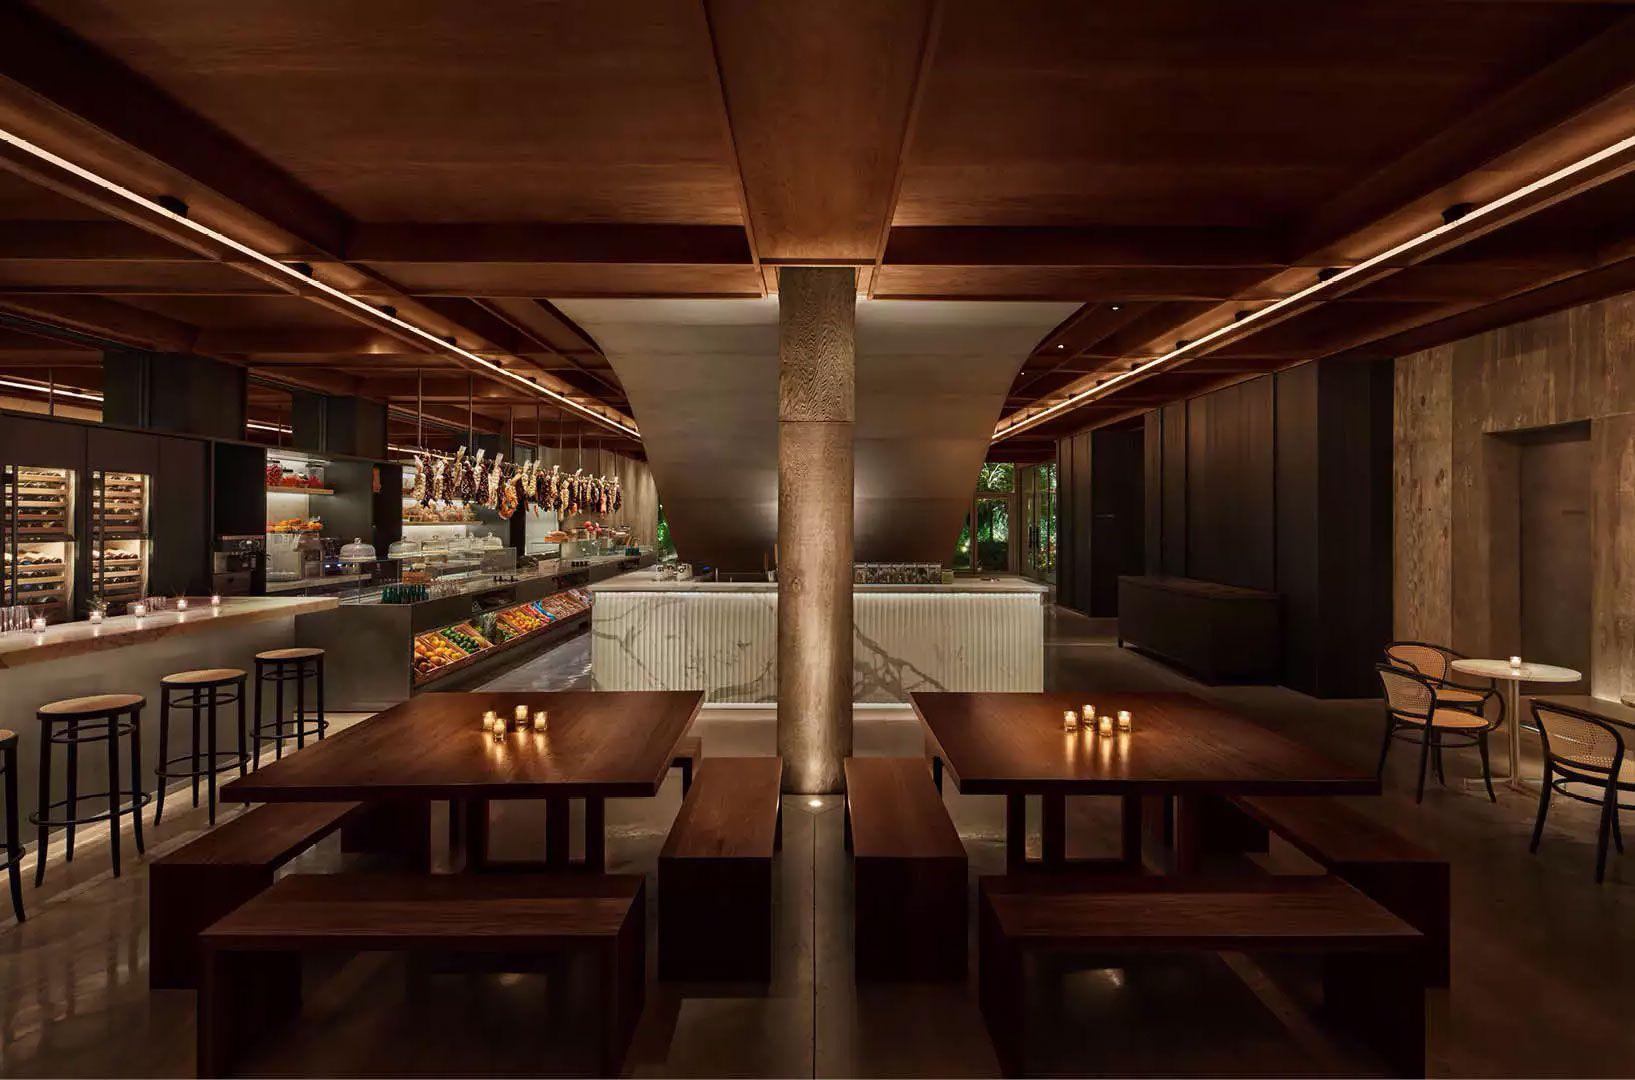 Public Hotel New York City An Ian Schrager Restaurants And Bars